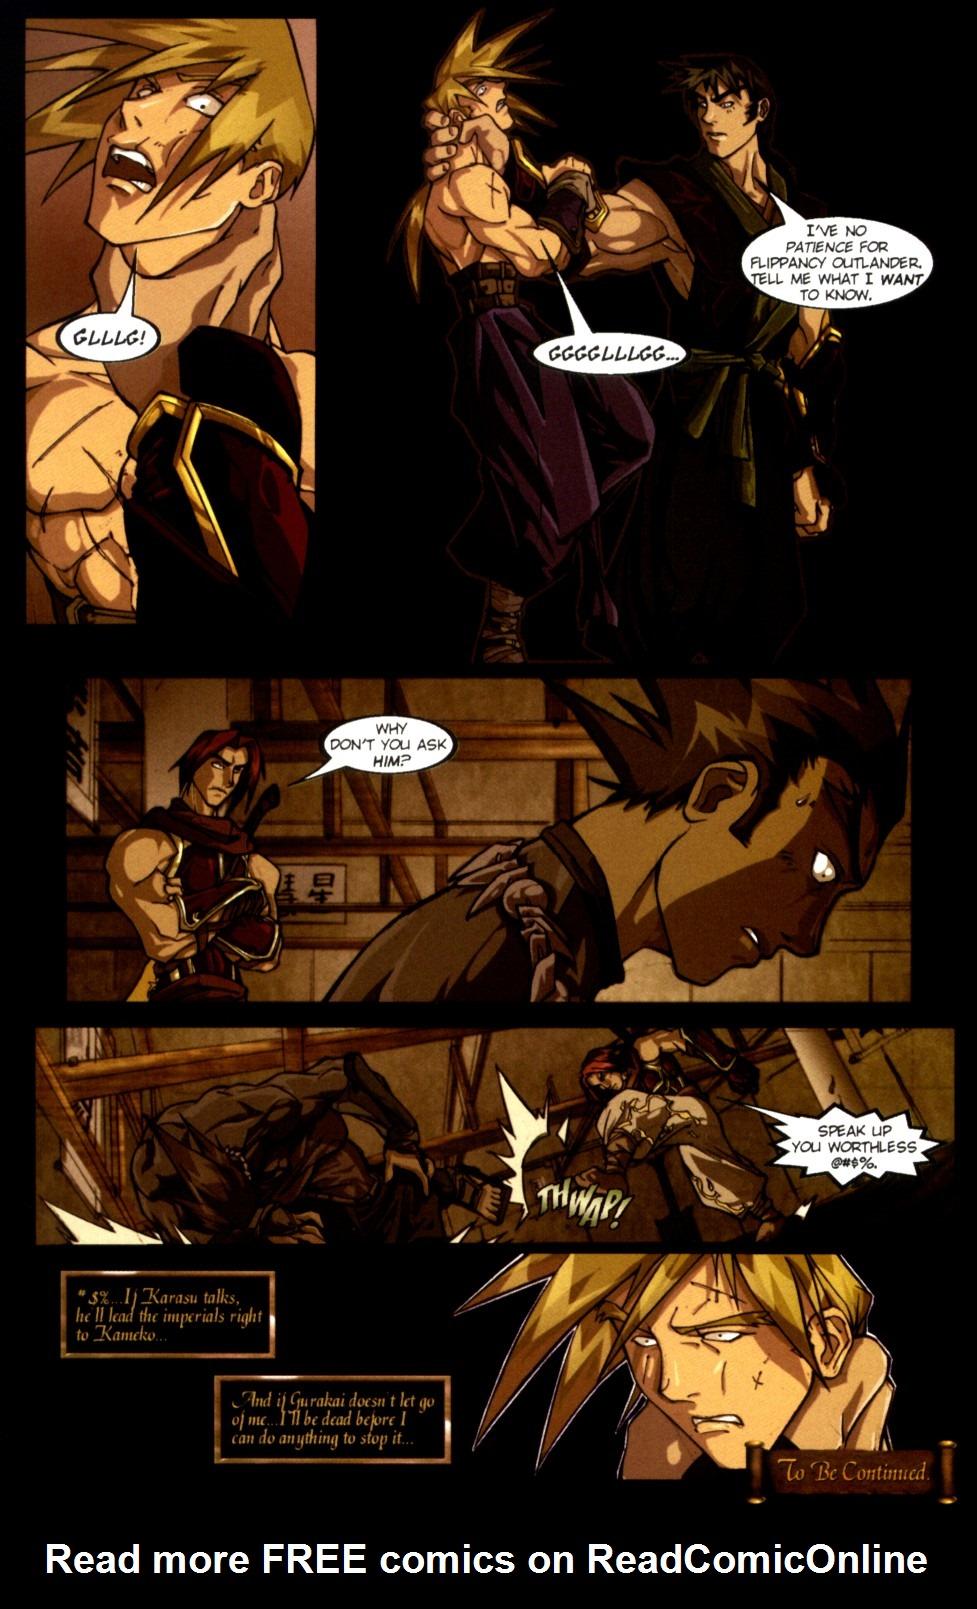 Read online Shidima comic -  Issue #3 - 23